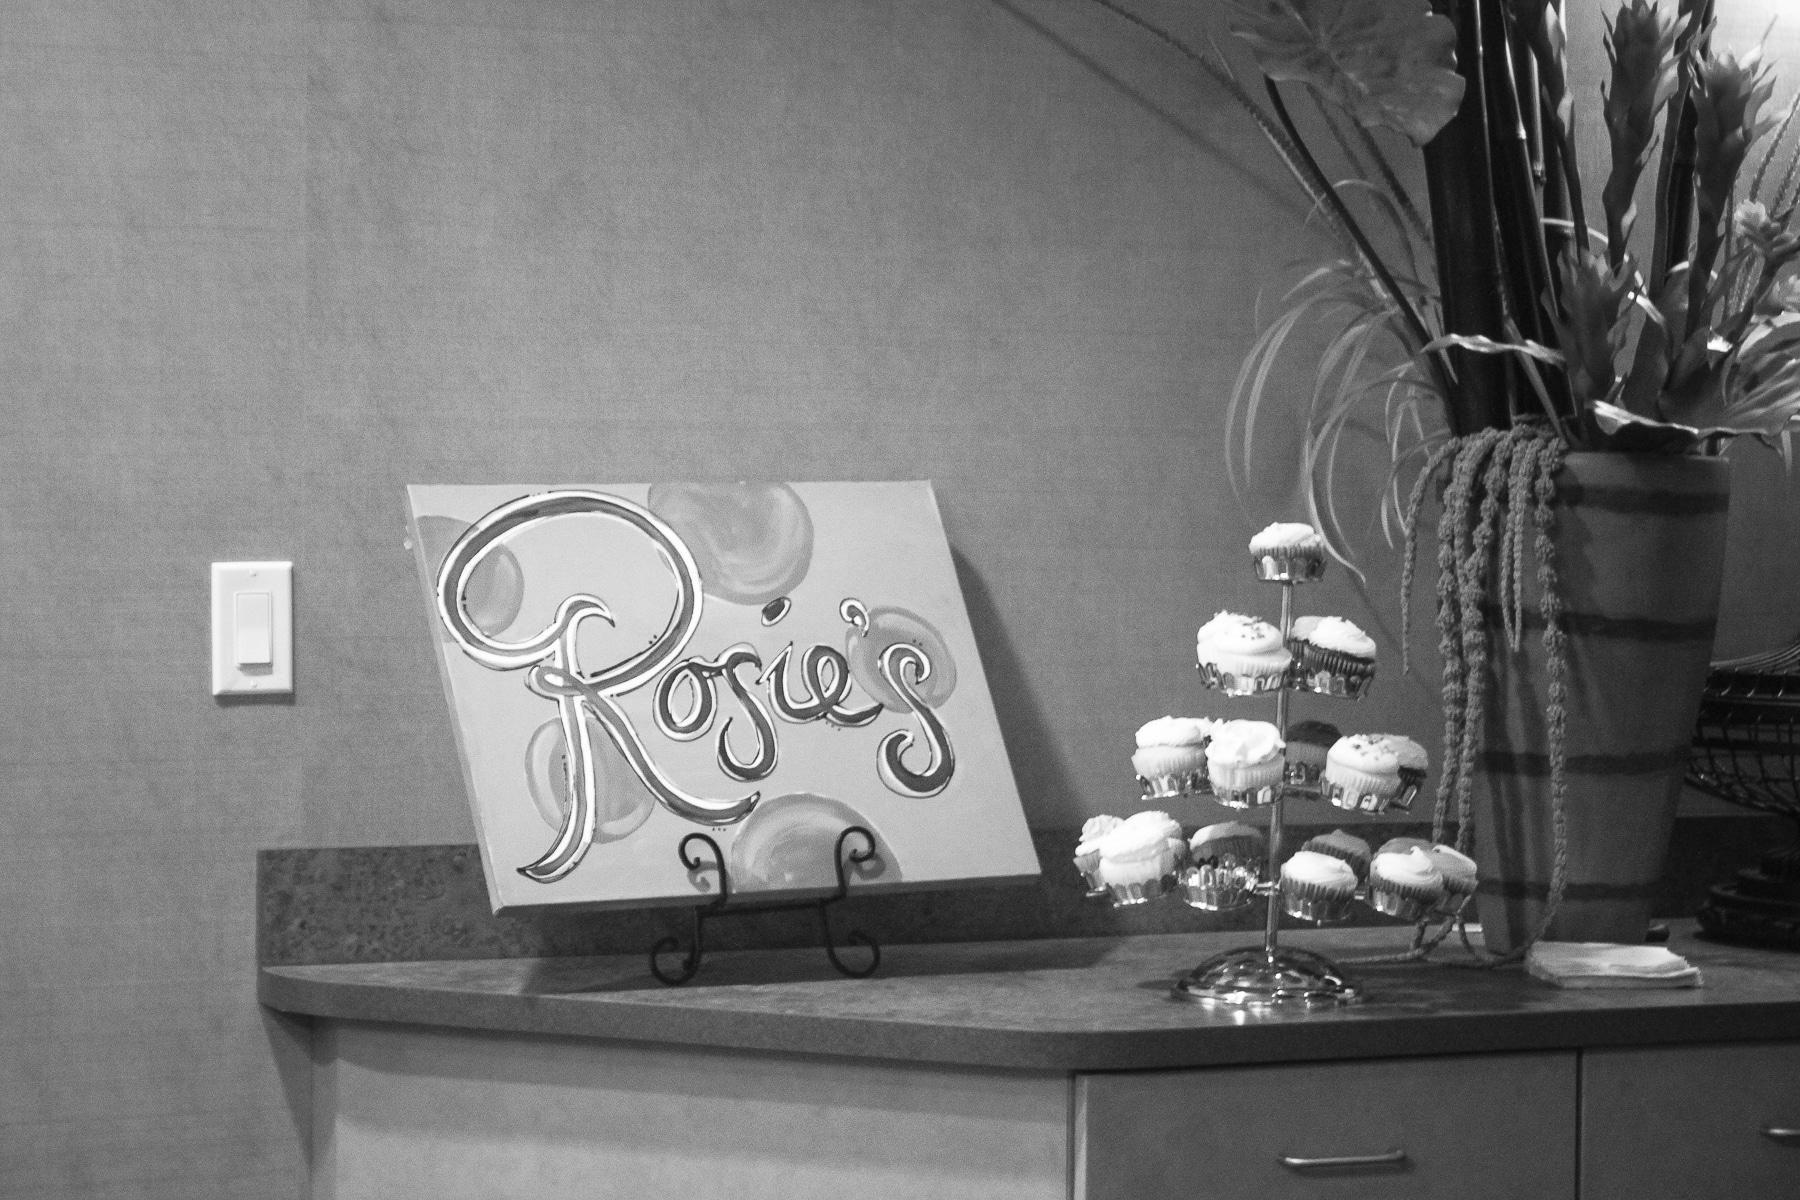 Rosies Creative Cakes Manheim Pa